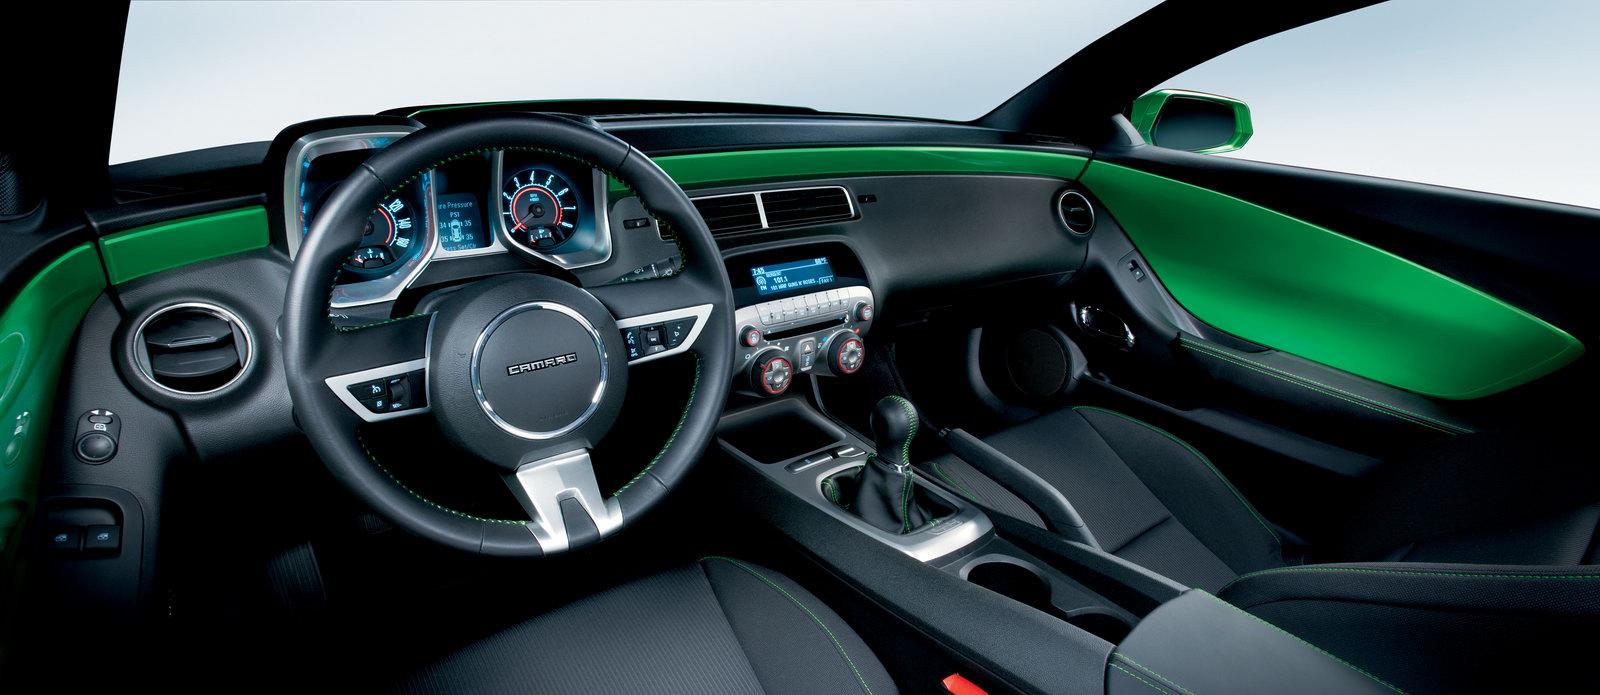 http://2.bp.blogspot.com/_FoXyvaPSnVk/S730YHEGTxI/AAAAAAACugU/oOFLSq4pEls/s1600/2010-Chevrolet-Camaro-Synergy-Green-2.jpg